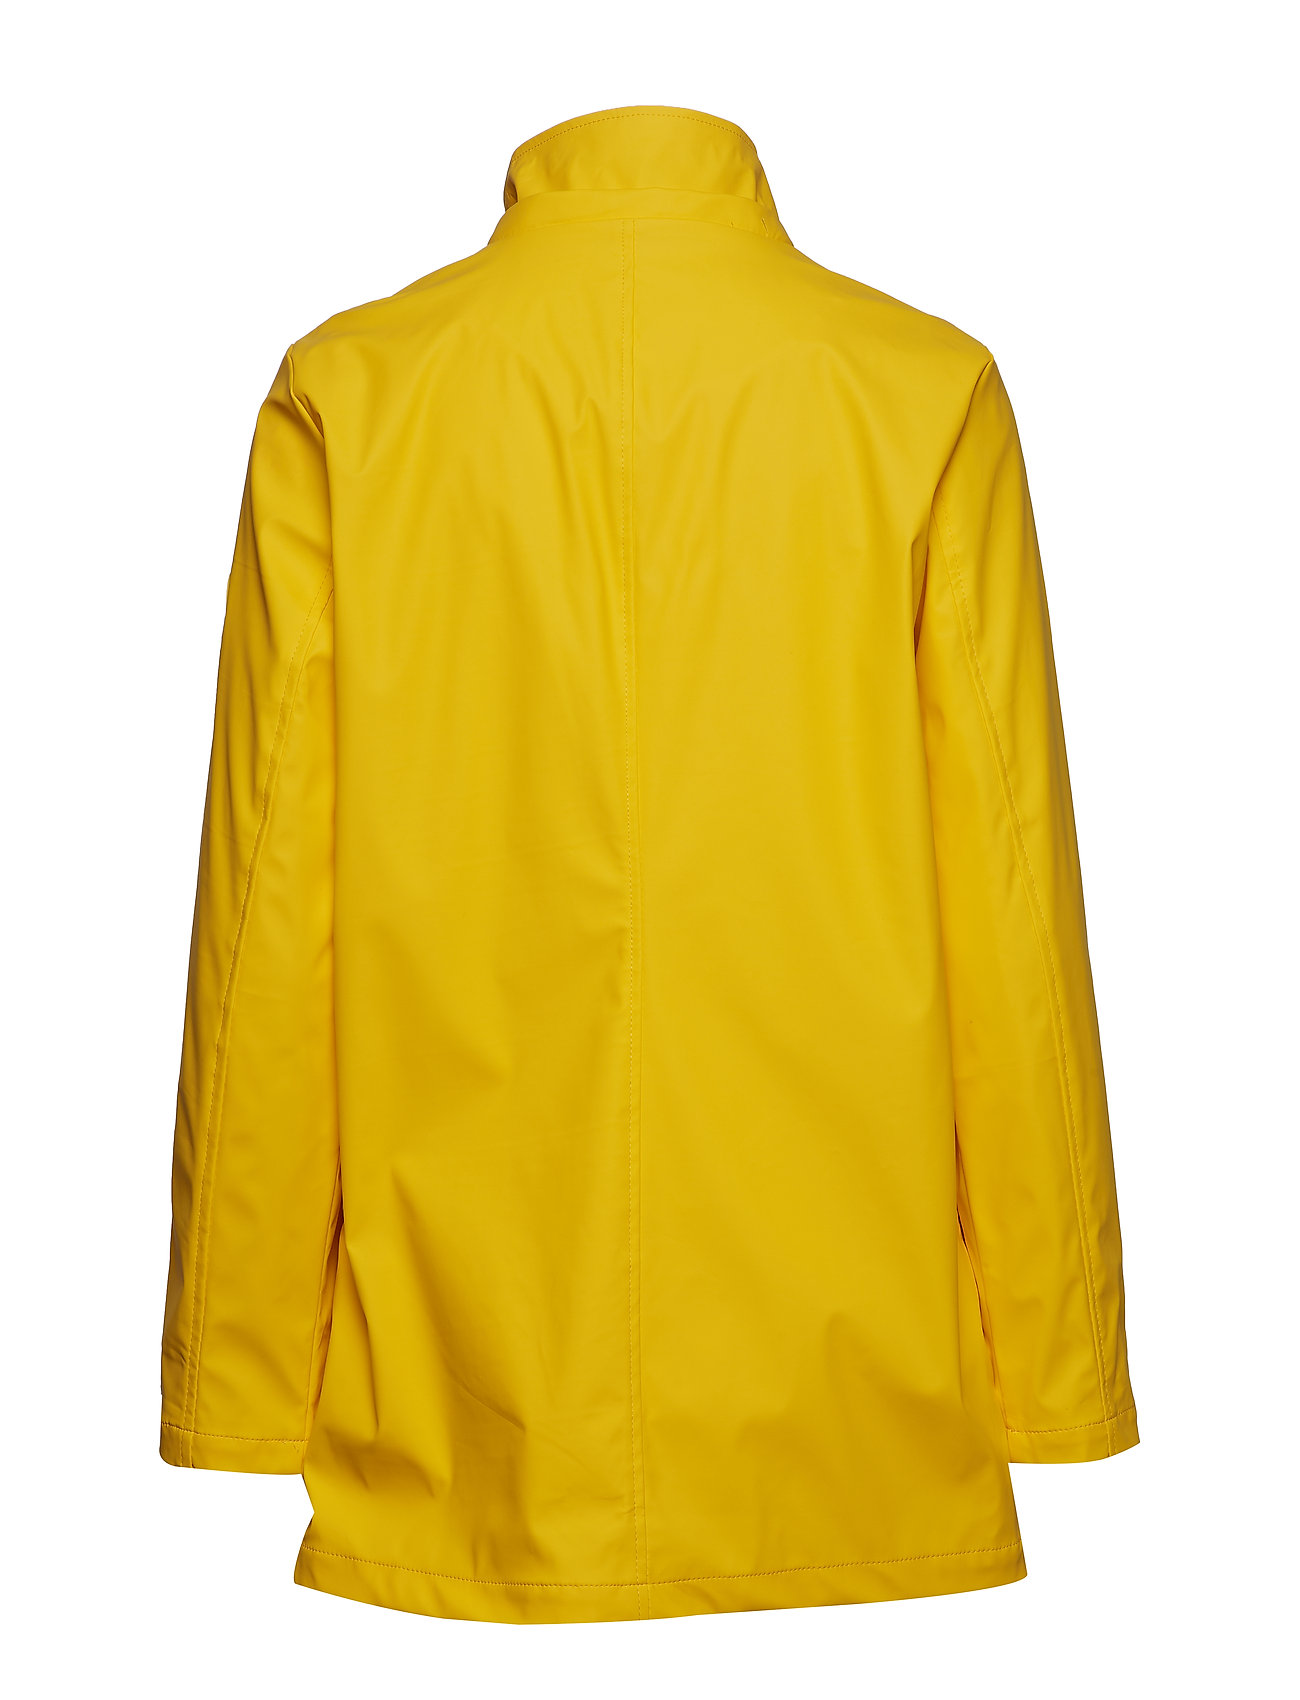 pu W Ralph Slicker Hoodwarm YellowLauren Slicker at 3q4j5AcRL